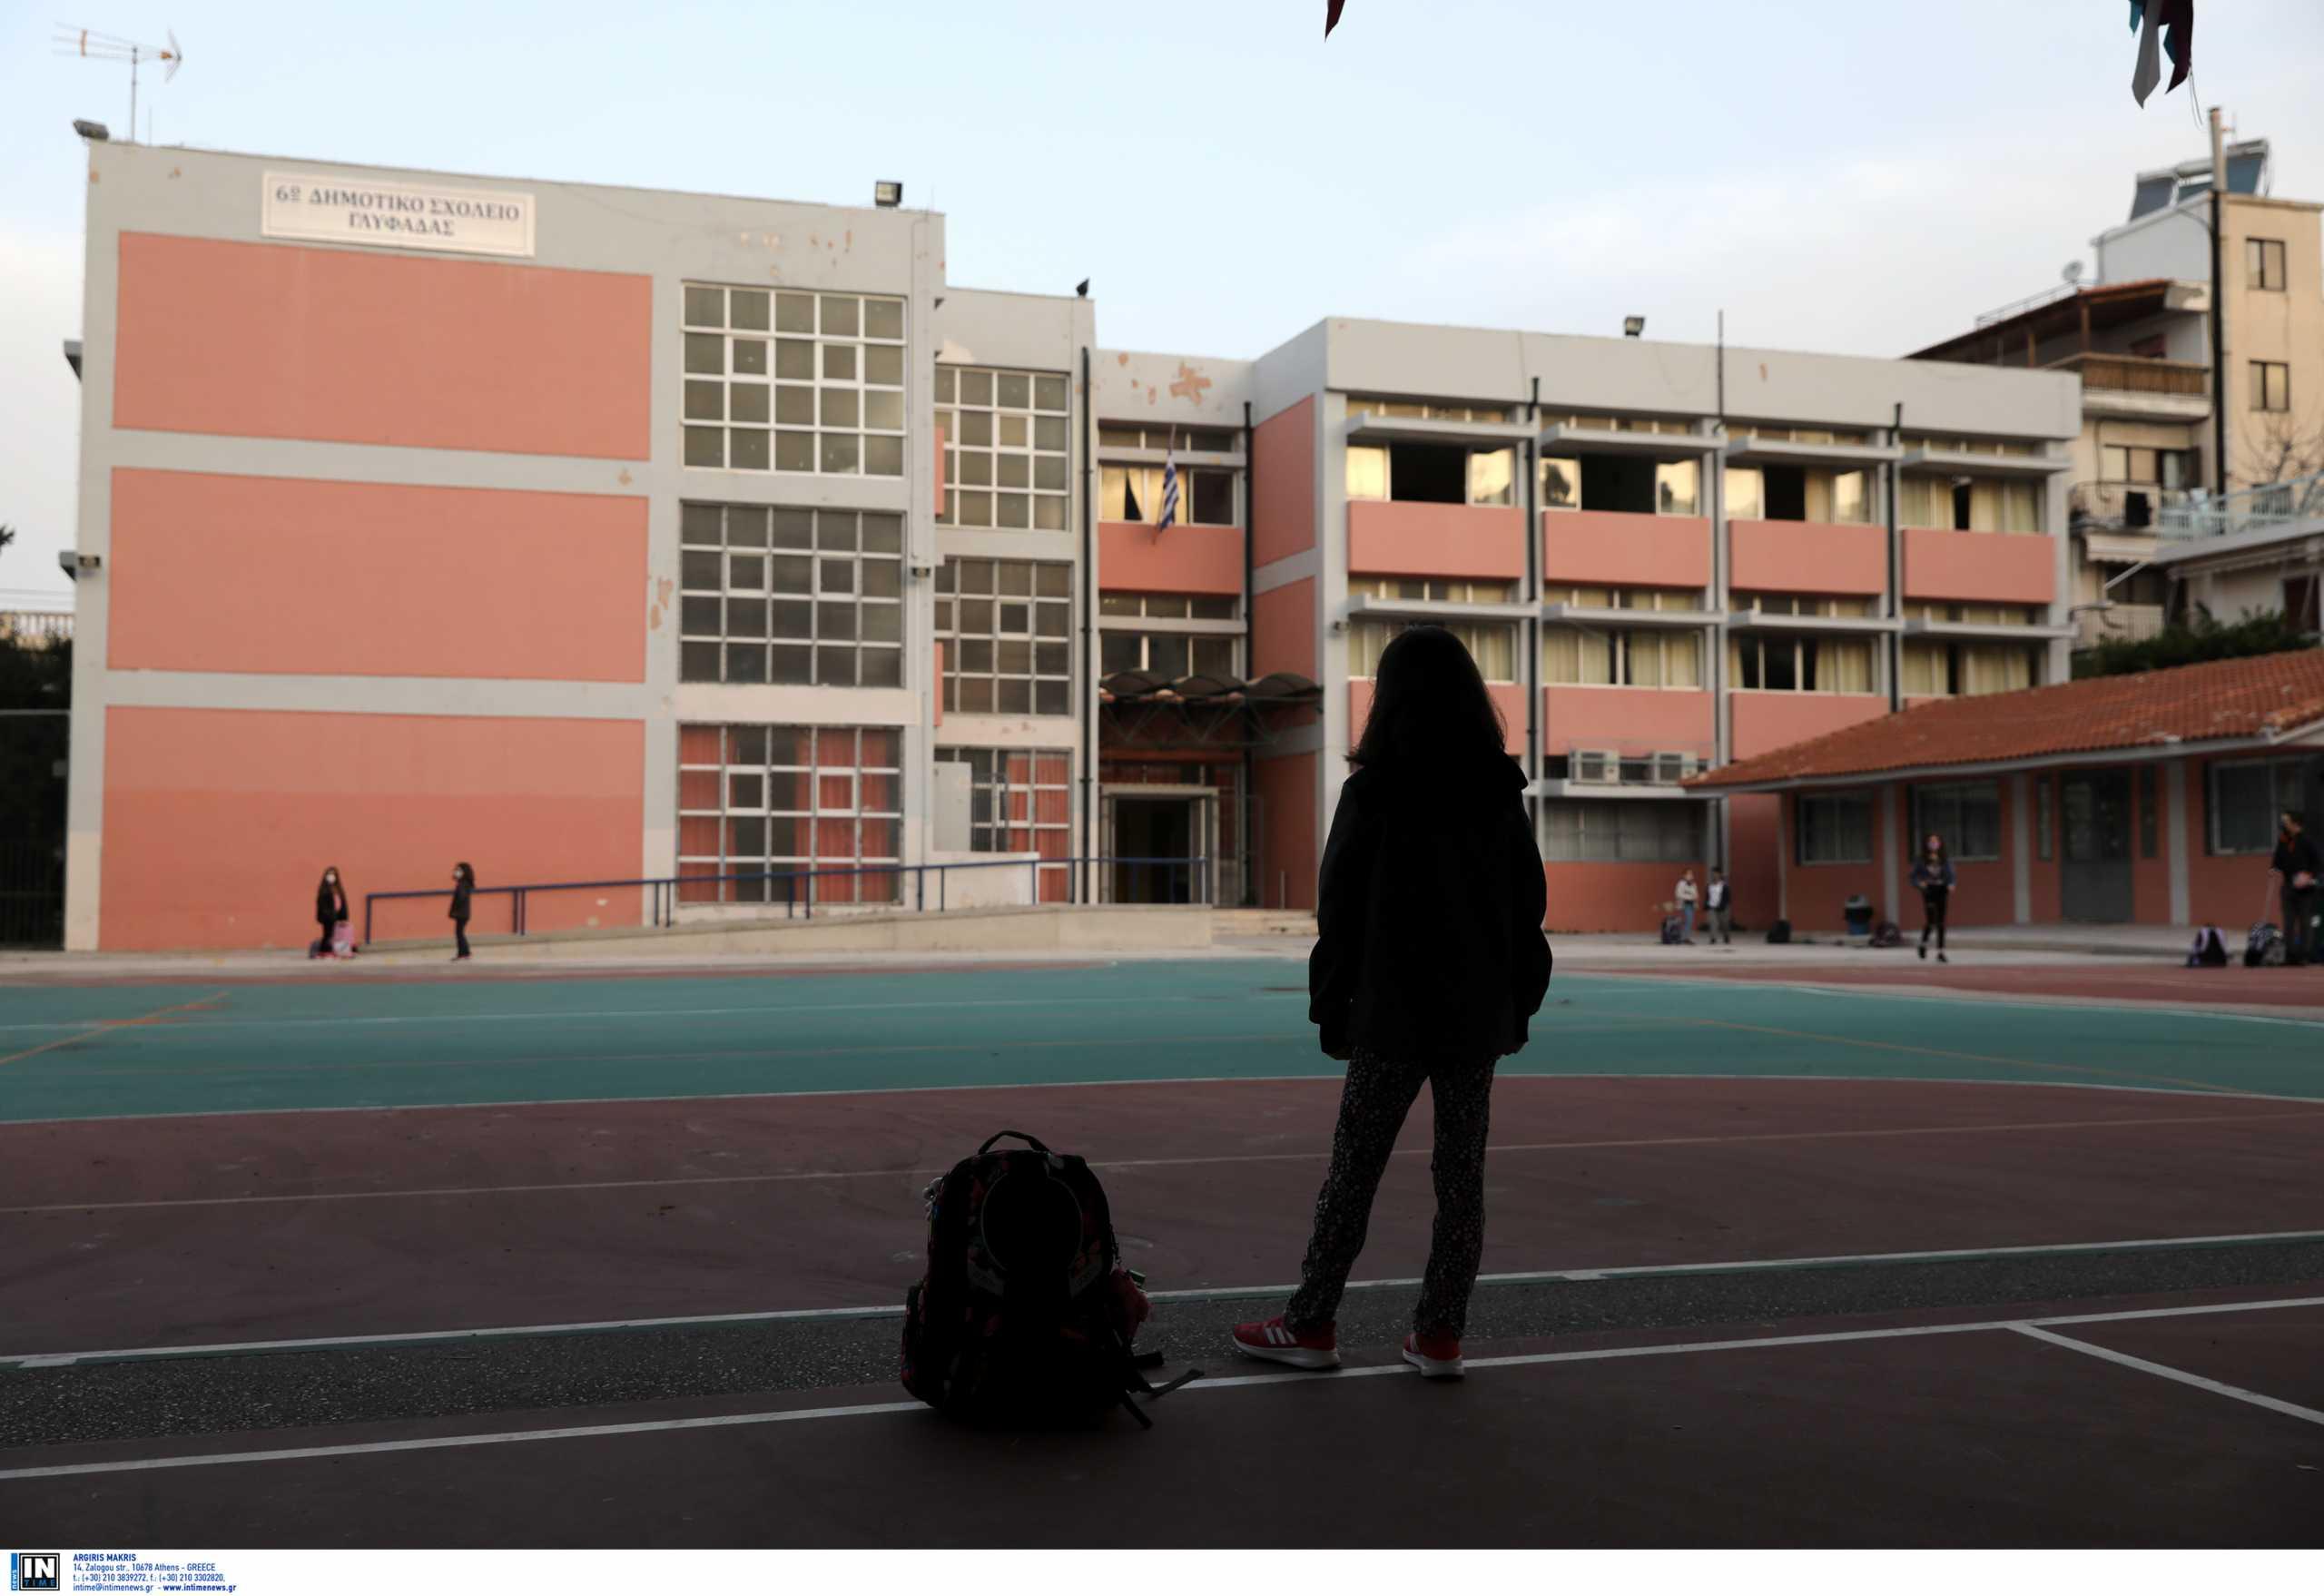 D-Day για τα σχολεία: Στο μικροσκόπιο των ειδικών το άνοιγμα Γυμνασίων και Λυκείων